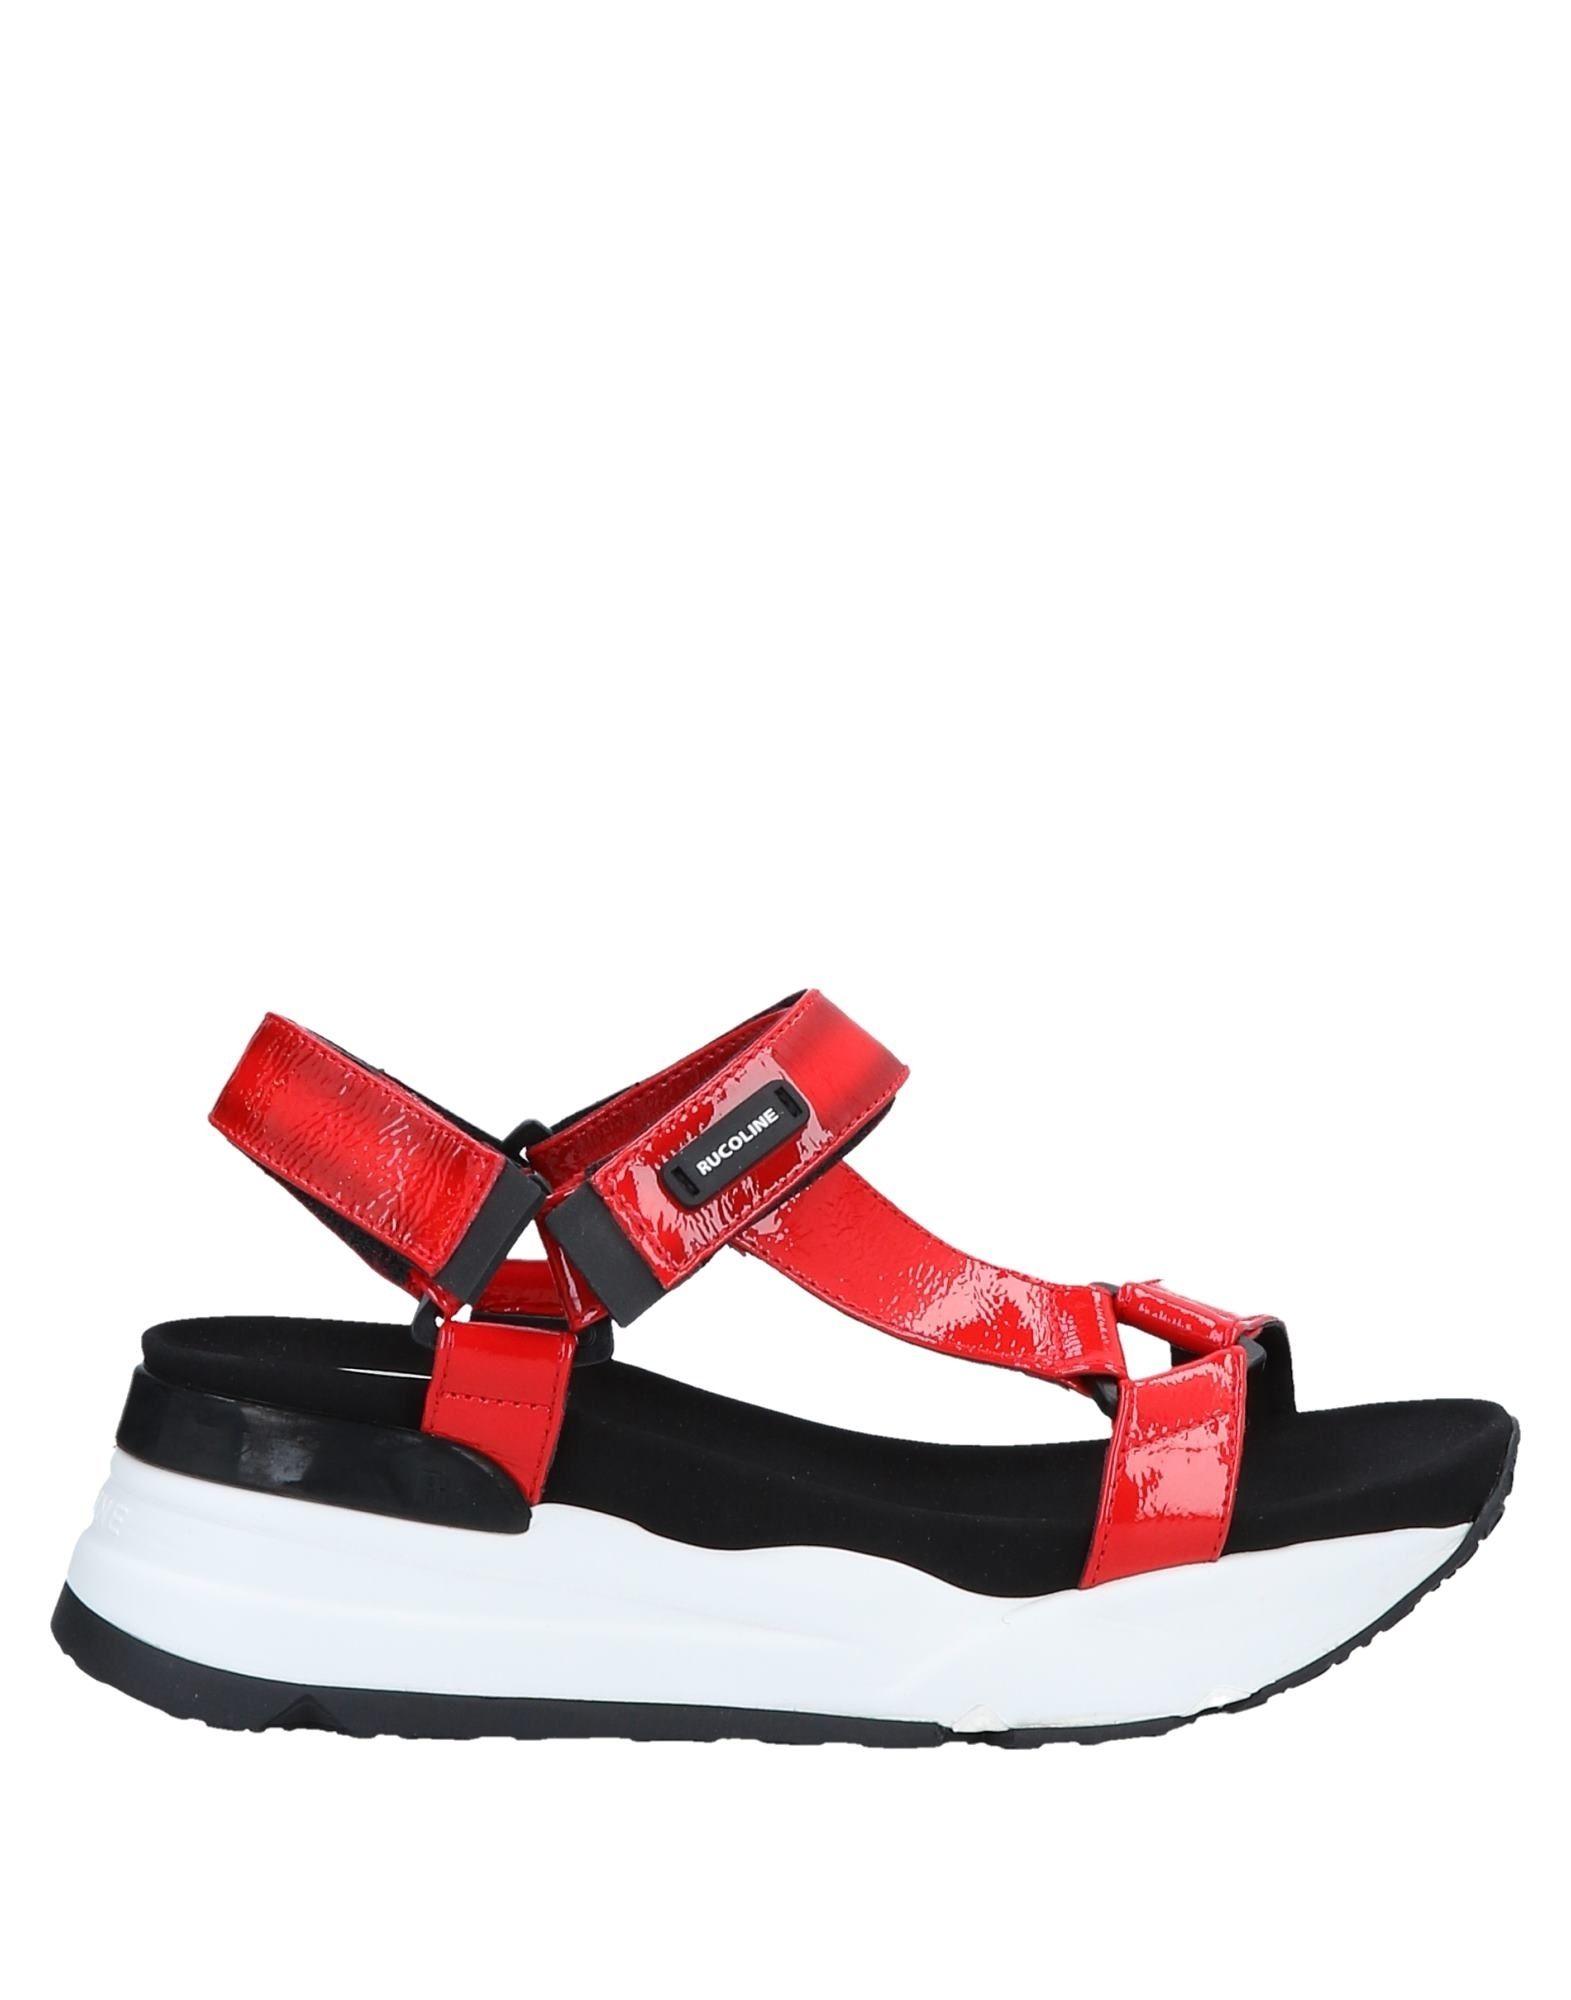 Stilvolle billige Schuhe Ruco 11567993TE Line Sandalen Damen  11567993TE Ruco 875f3e